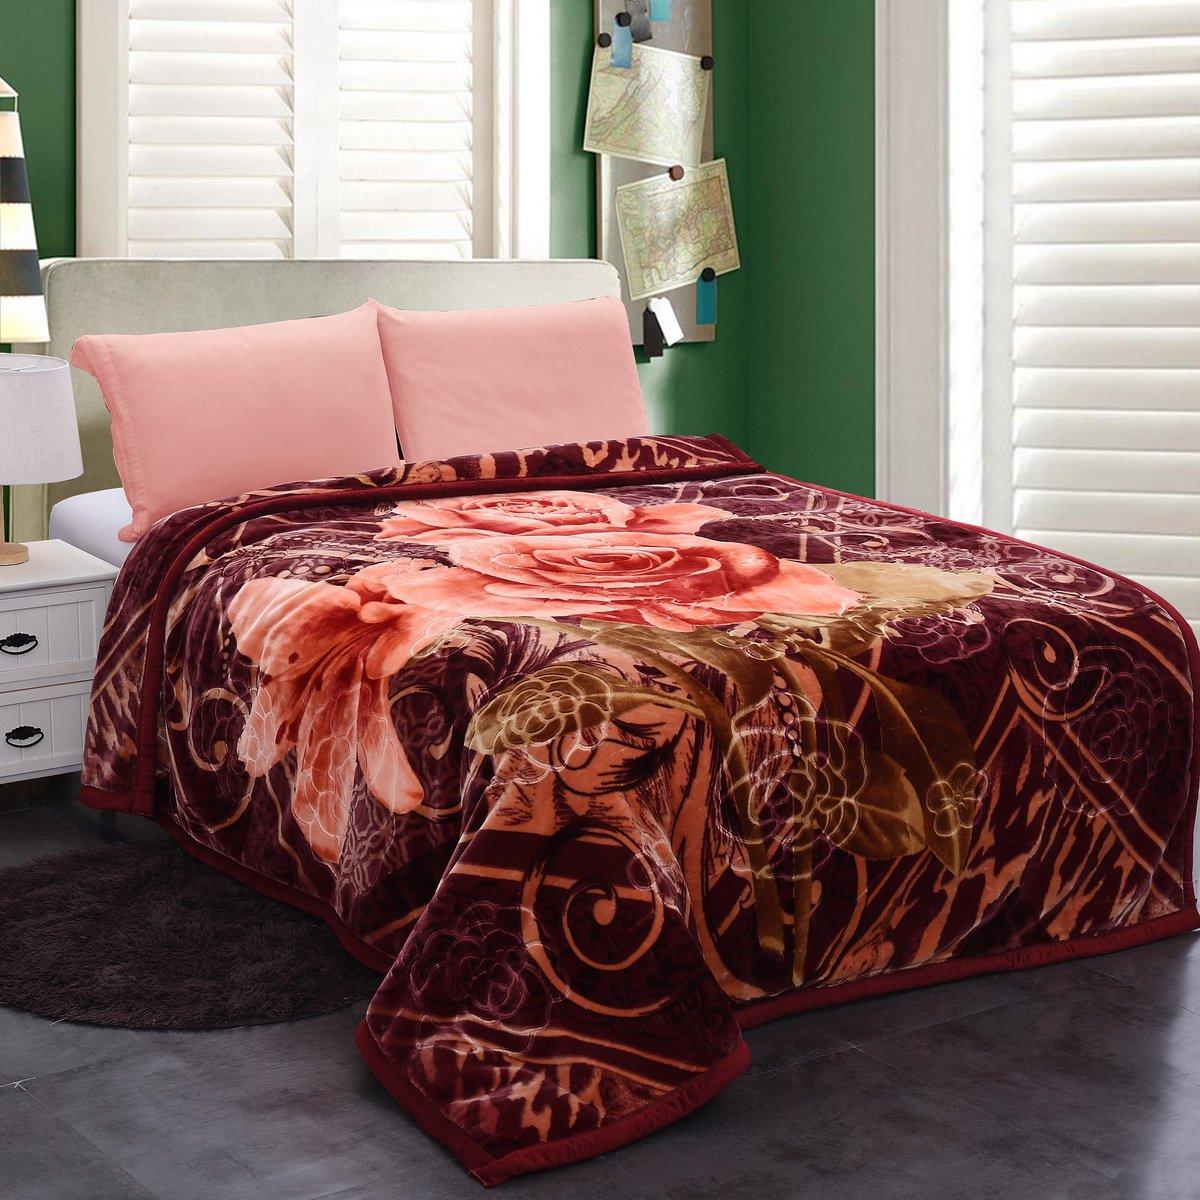 Amazoncom Jml Heavy Warm Blanket Plush Blankets